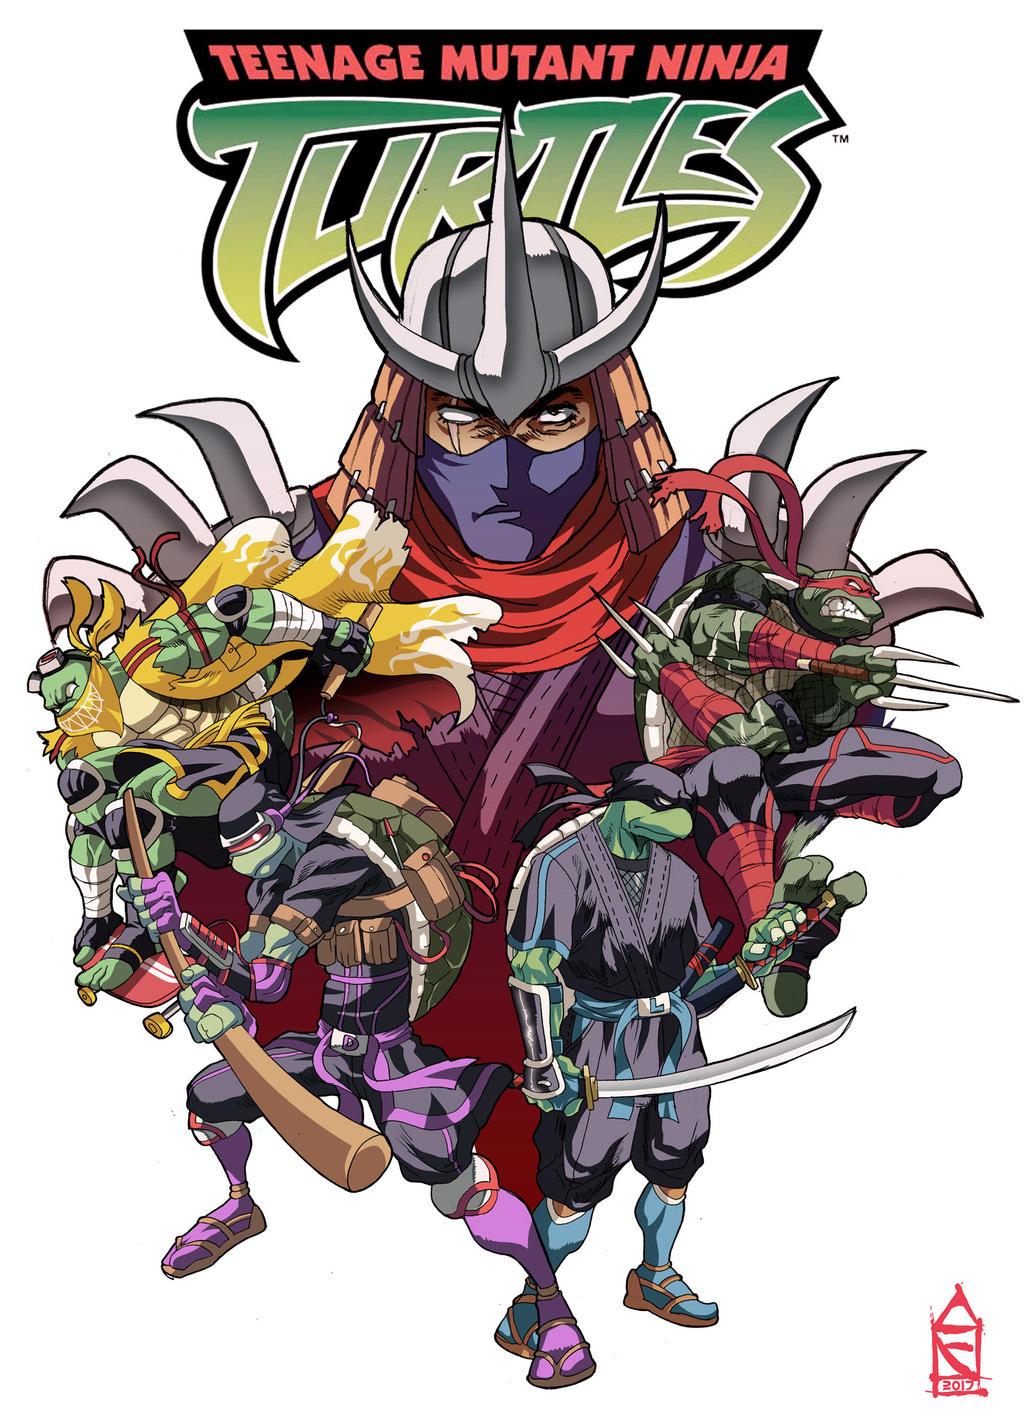 Teenage Mutant Ninja Turtles by ZehB on DeviantArt